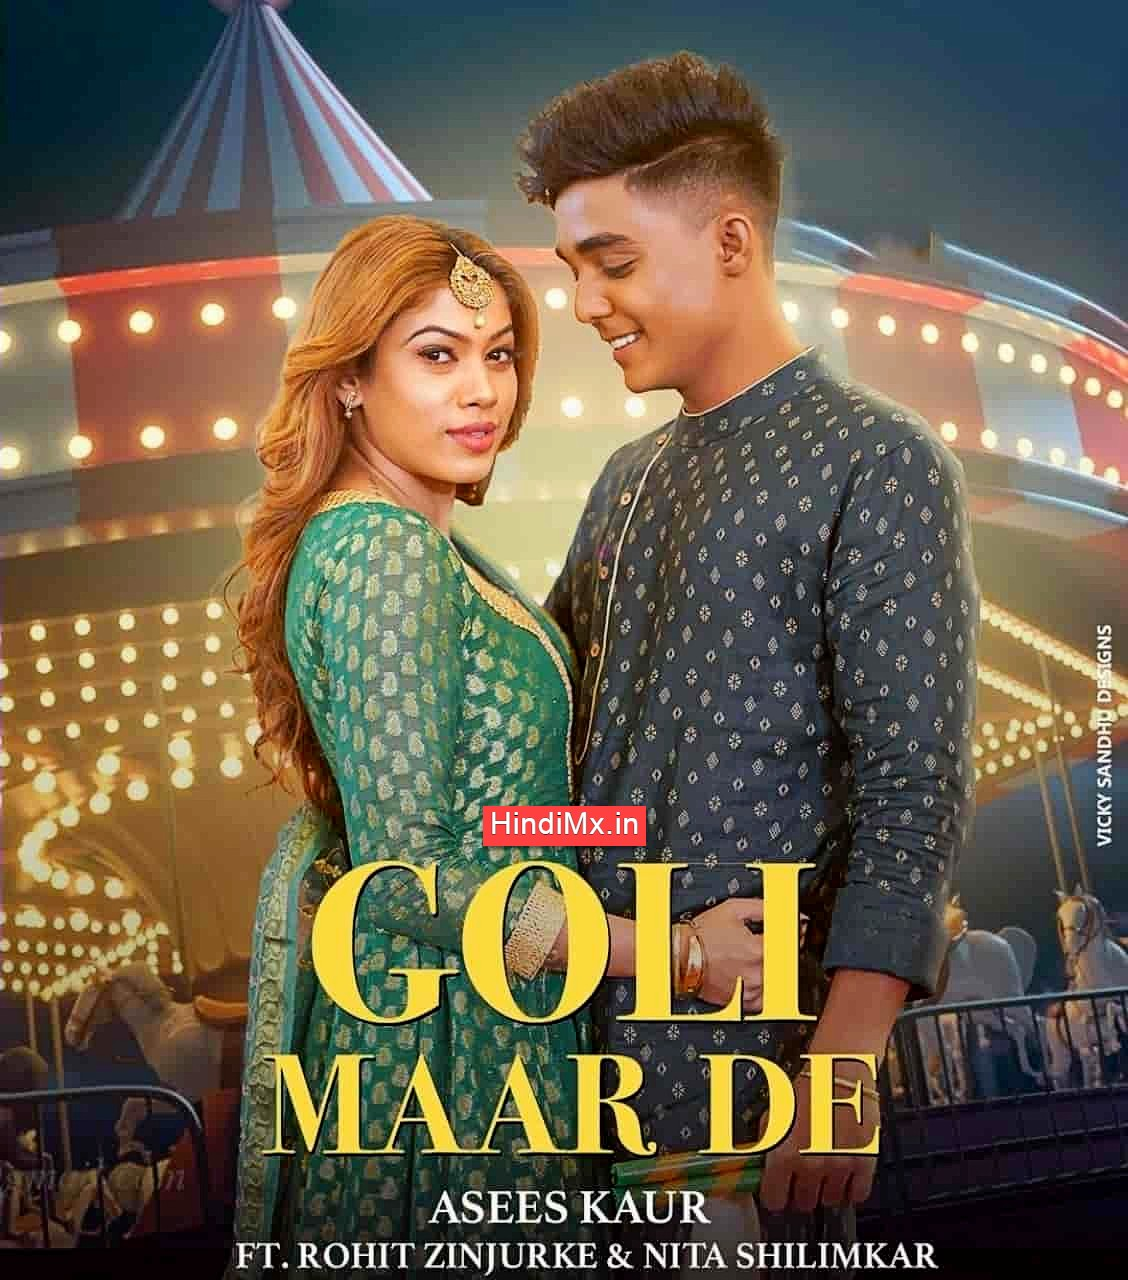 गोली मार दे Goli Maar De Lyrics in Hindi – Hindimx